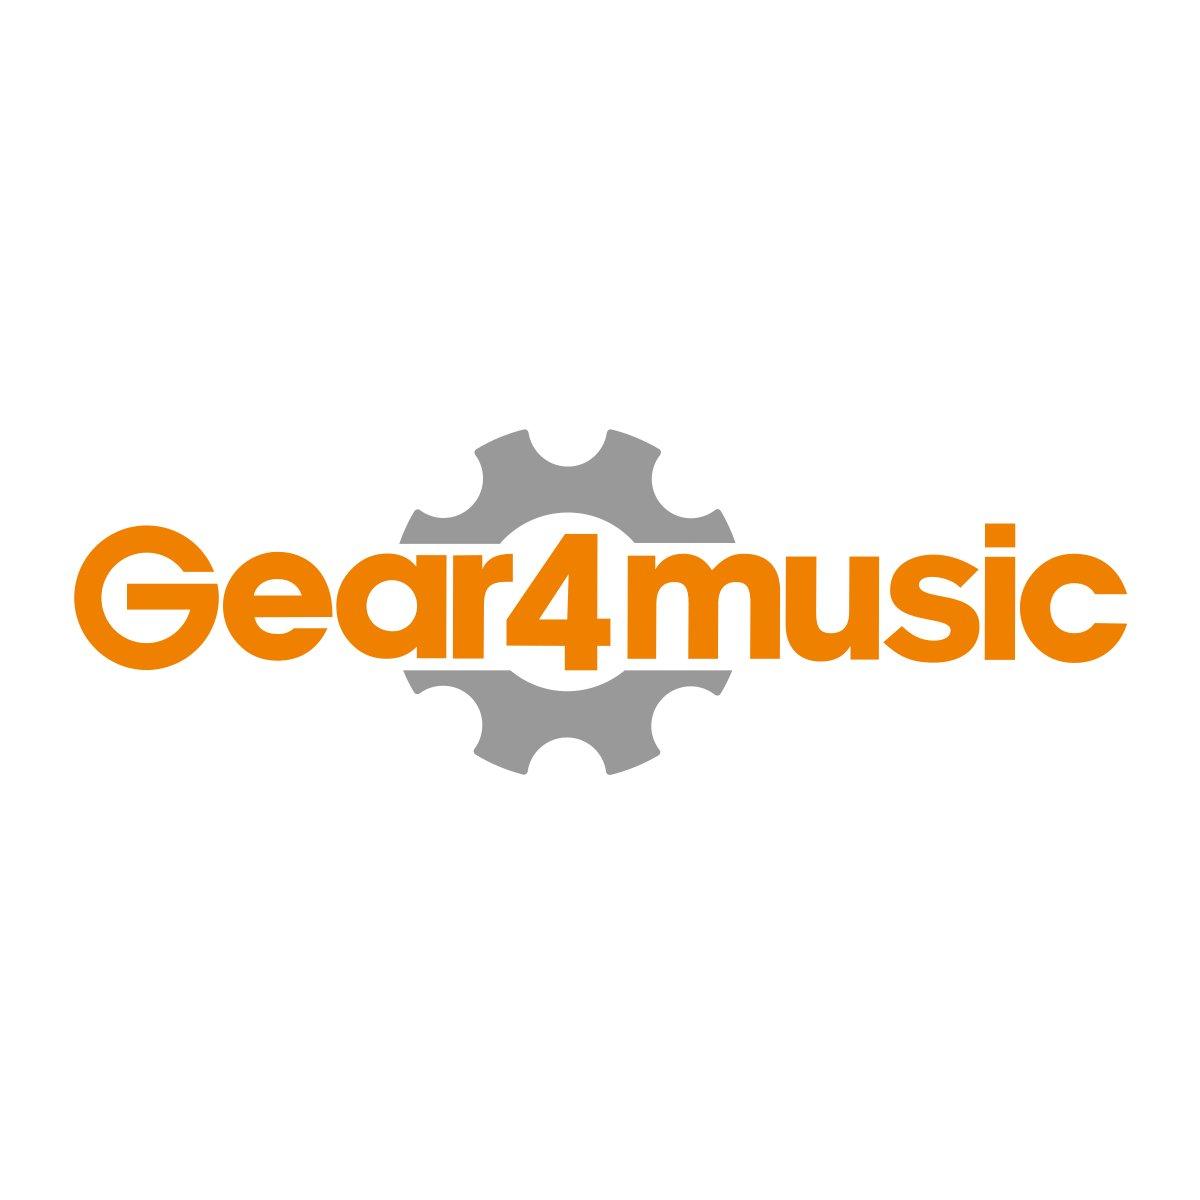 Ukulele de Gear4music, Vermelho